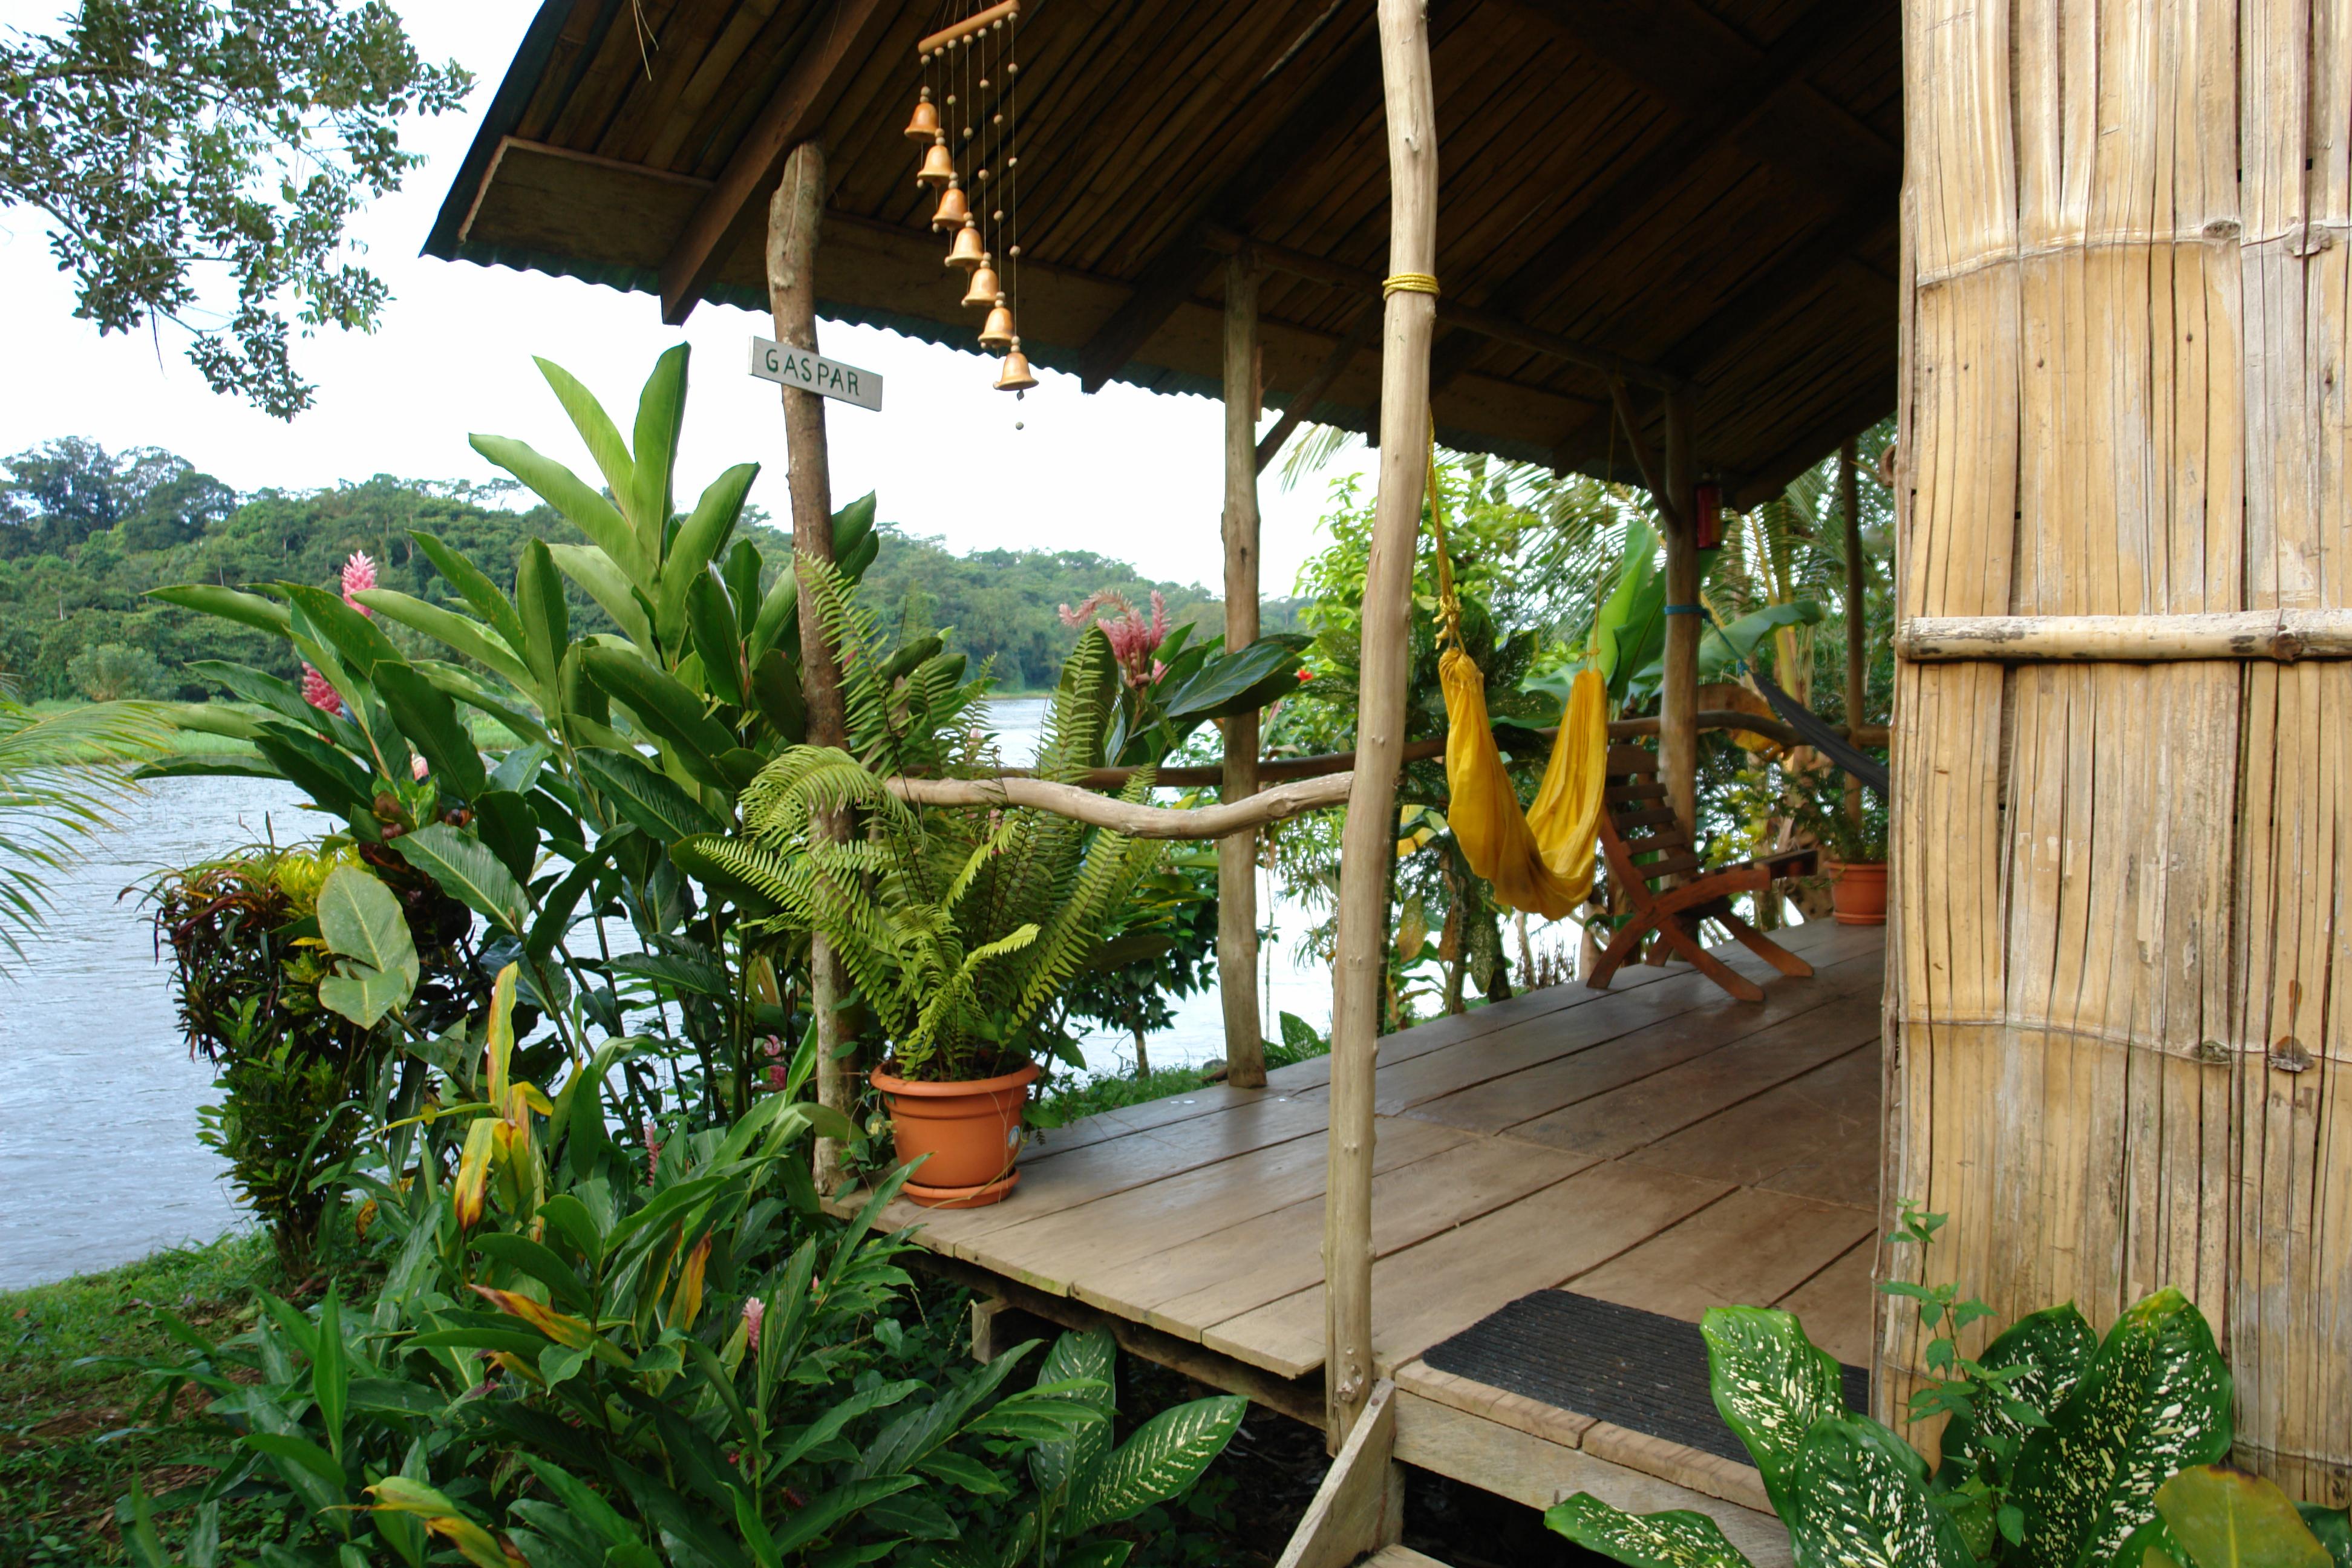 Authentic lodge near River San Juan